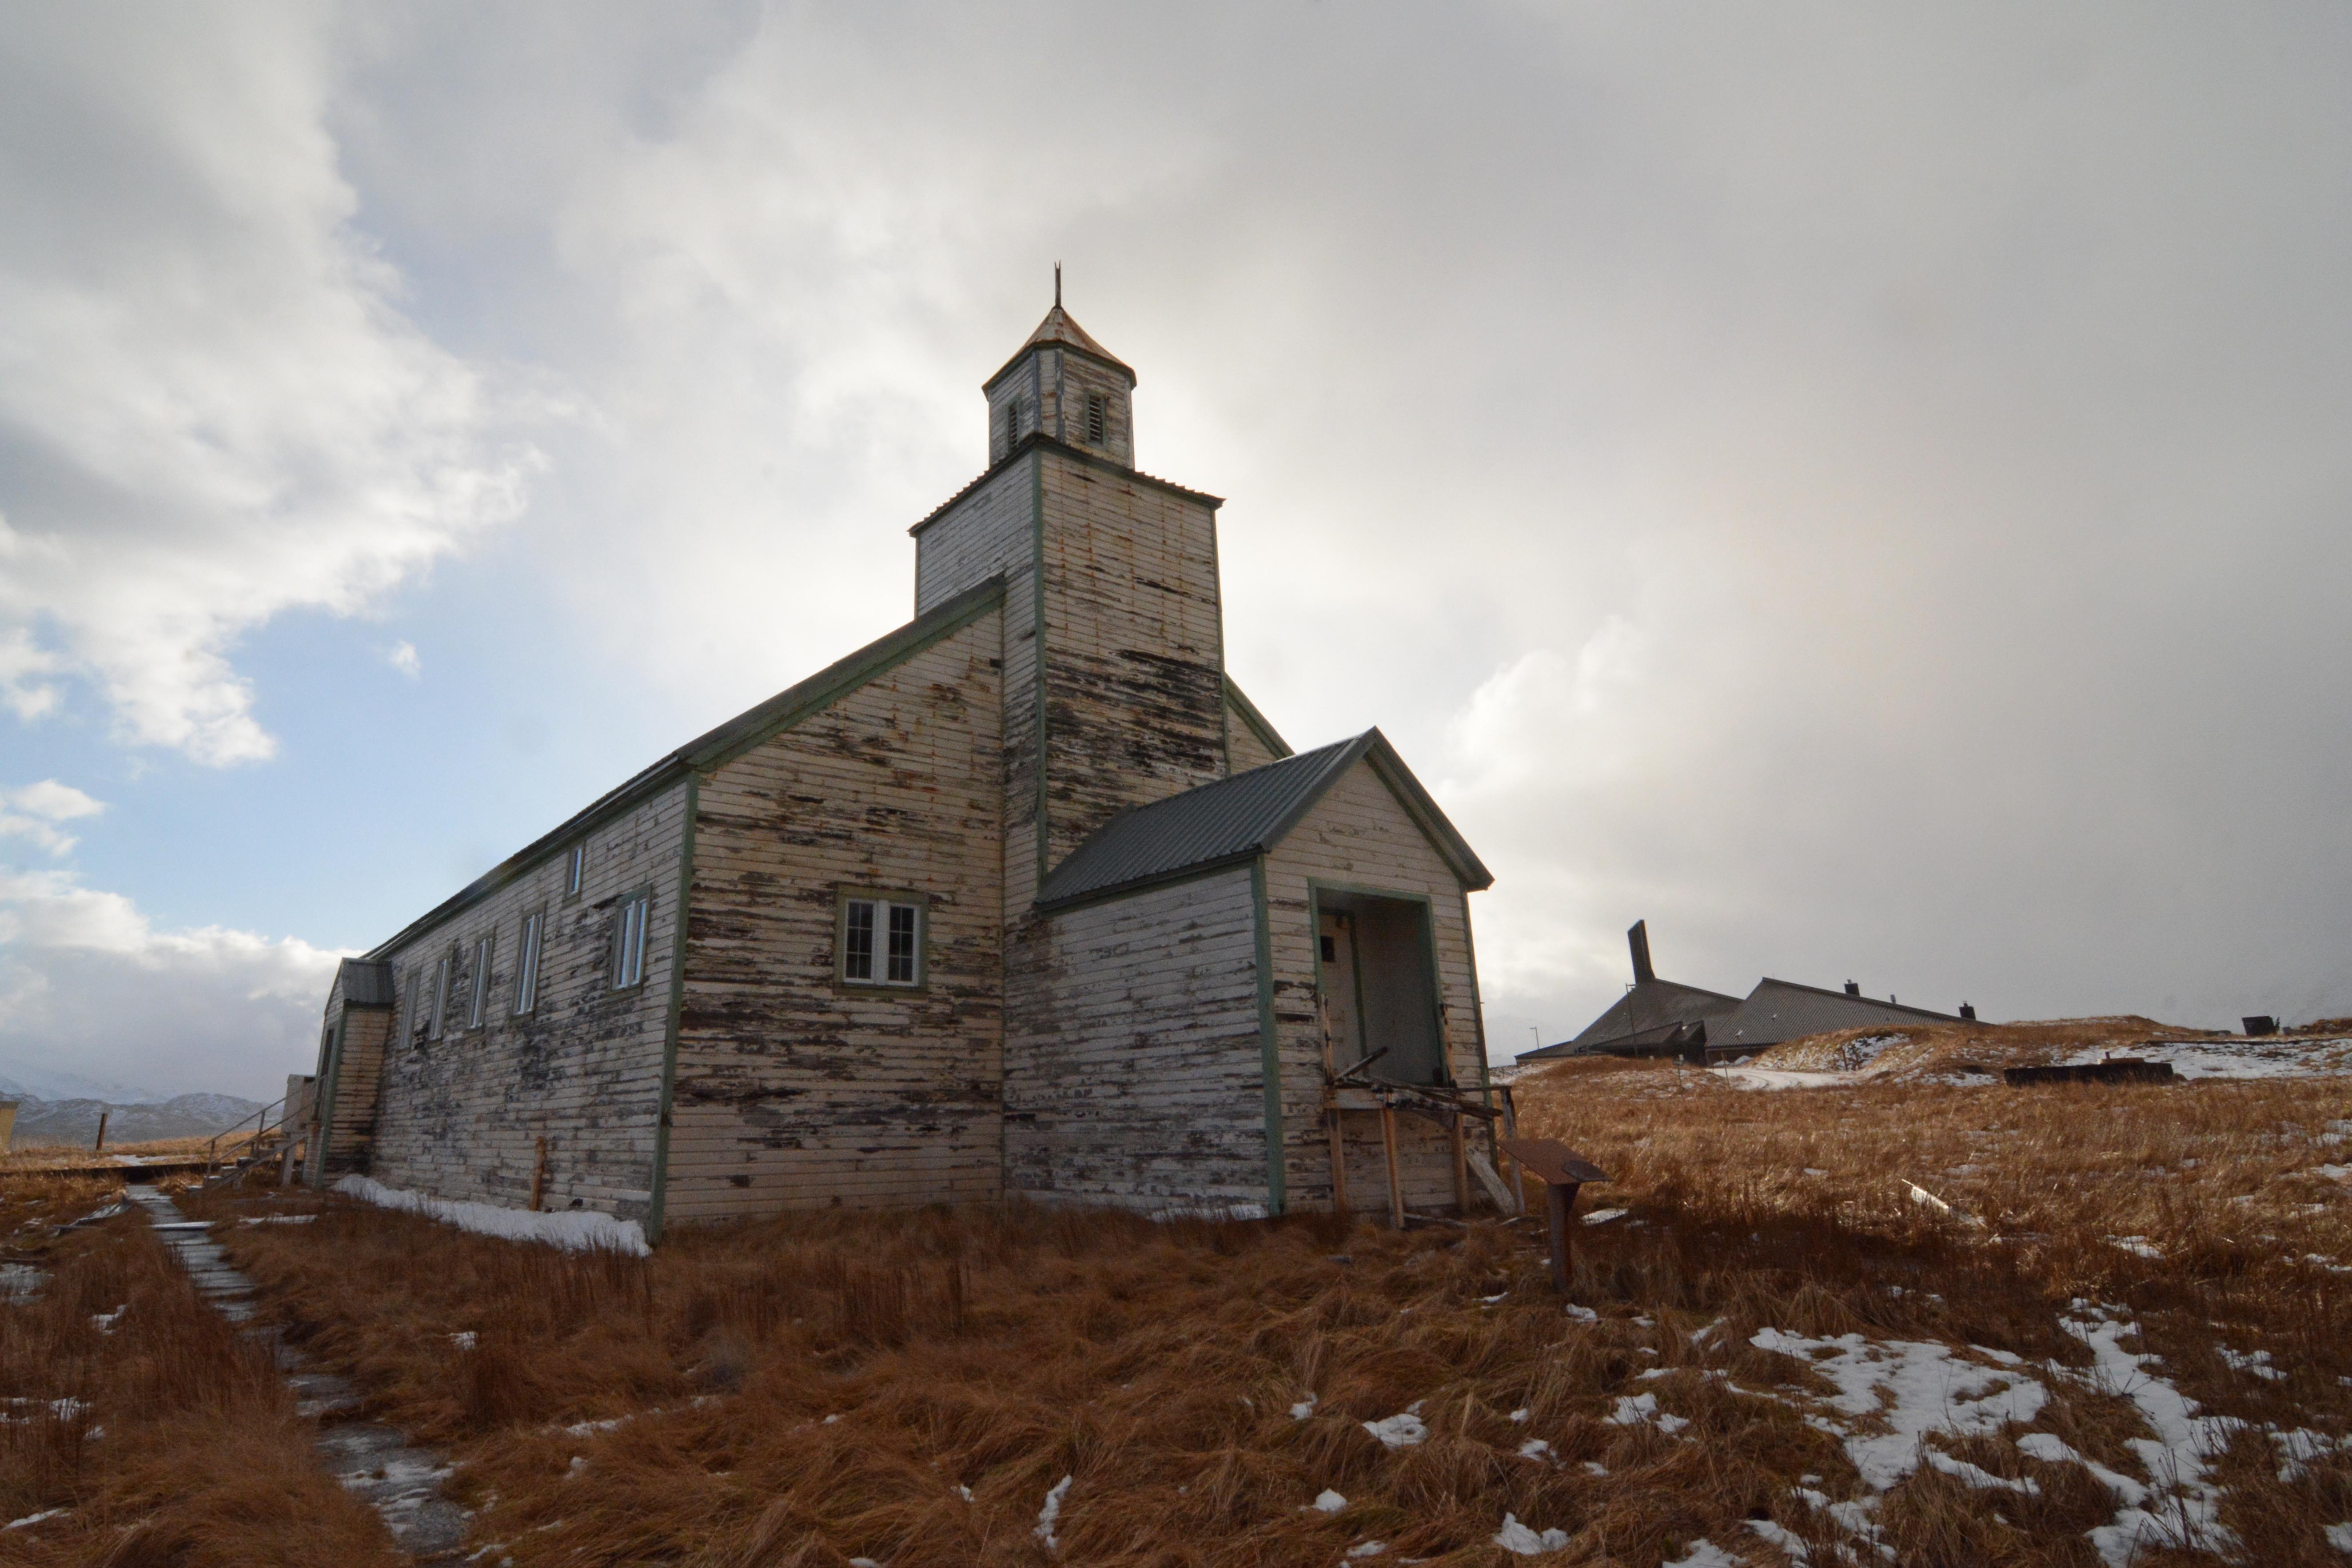 Church Buildings For Sale In Riverside Ca